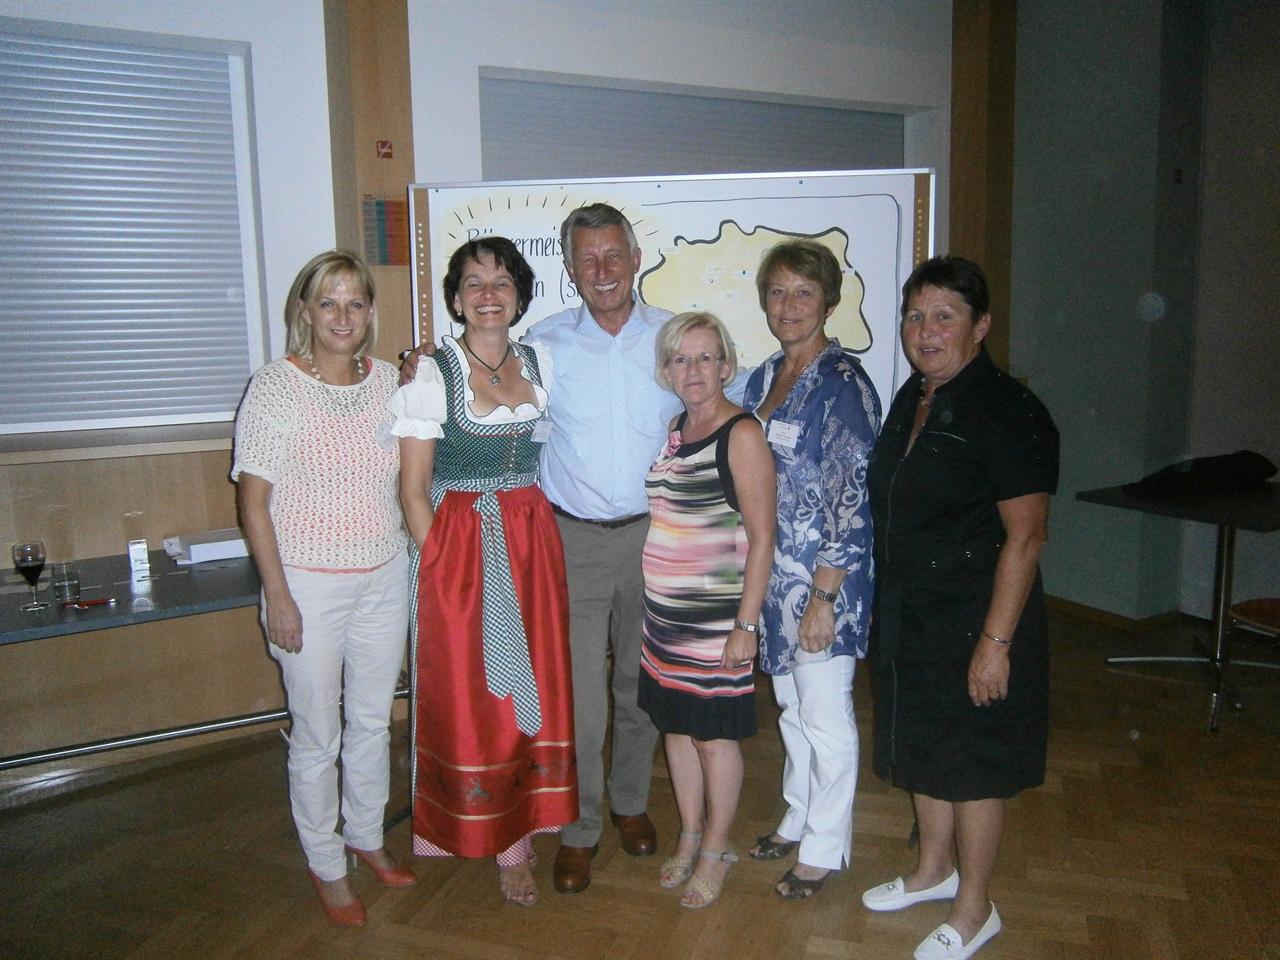 Brgermeisterinnentreffen - Katzelsdorf an der Leitha